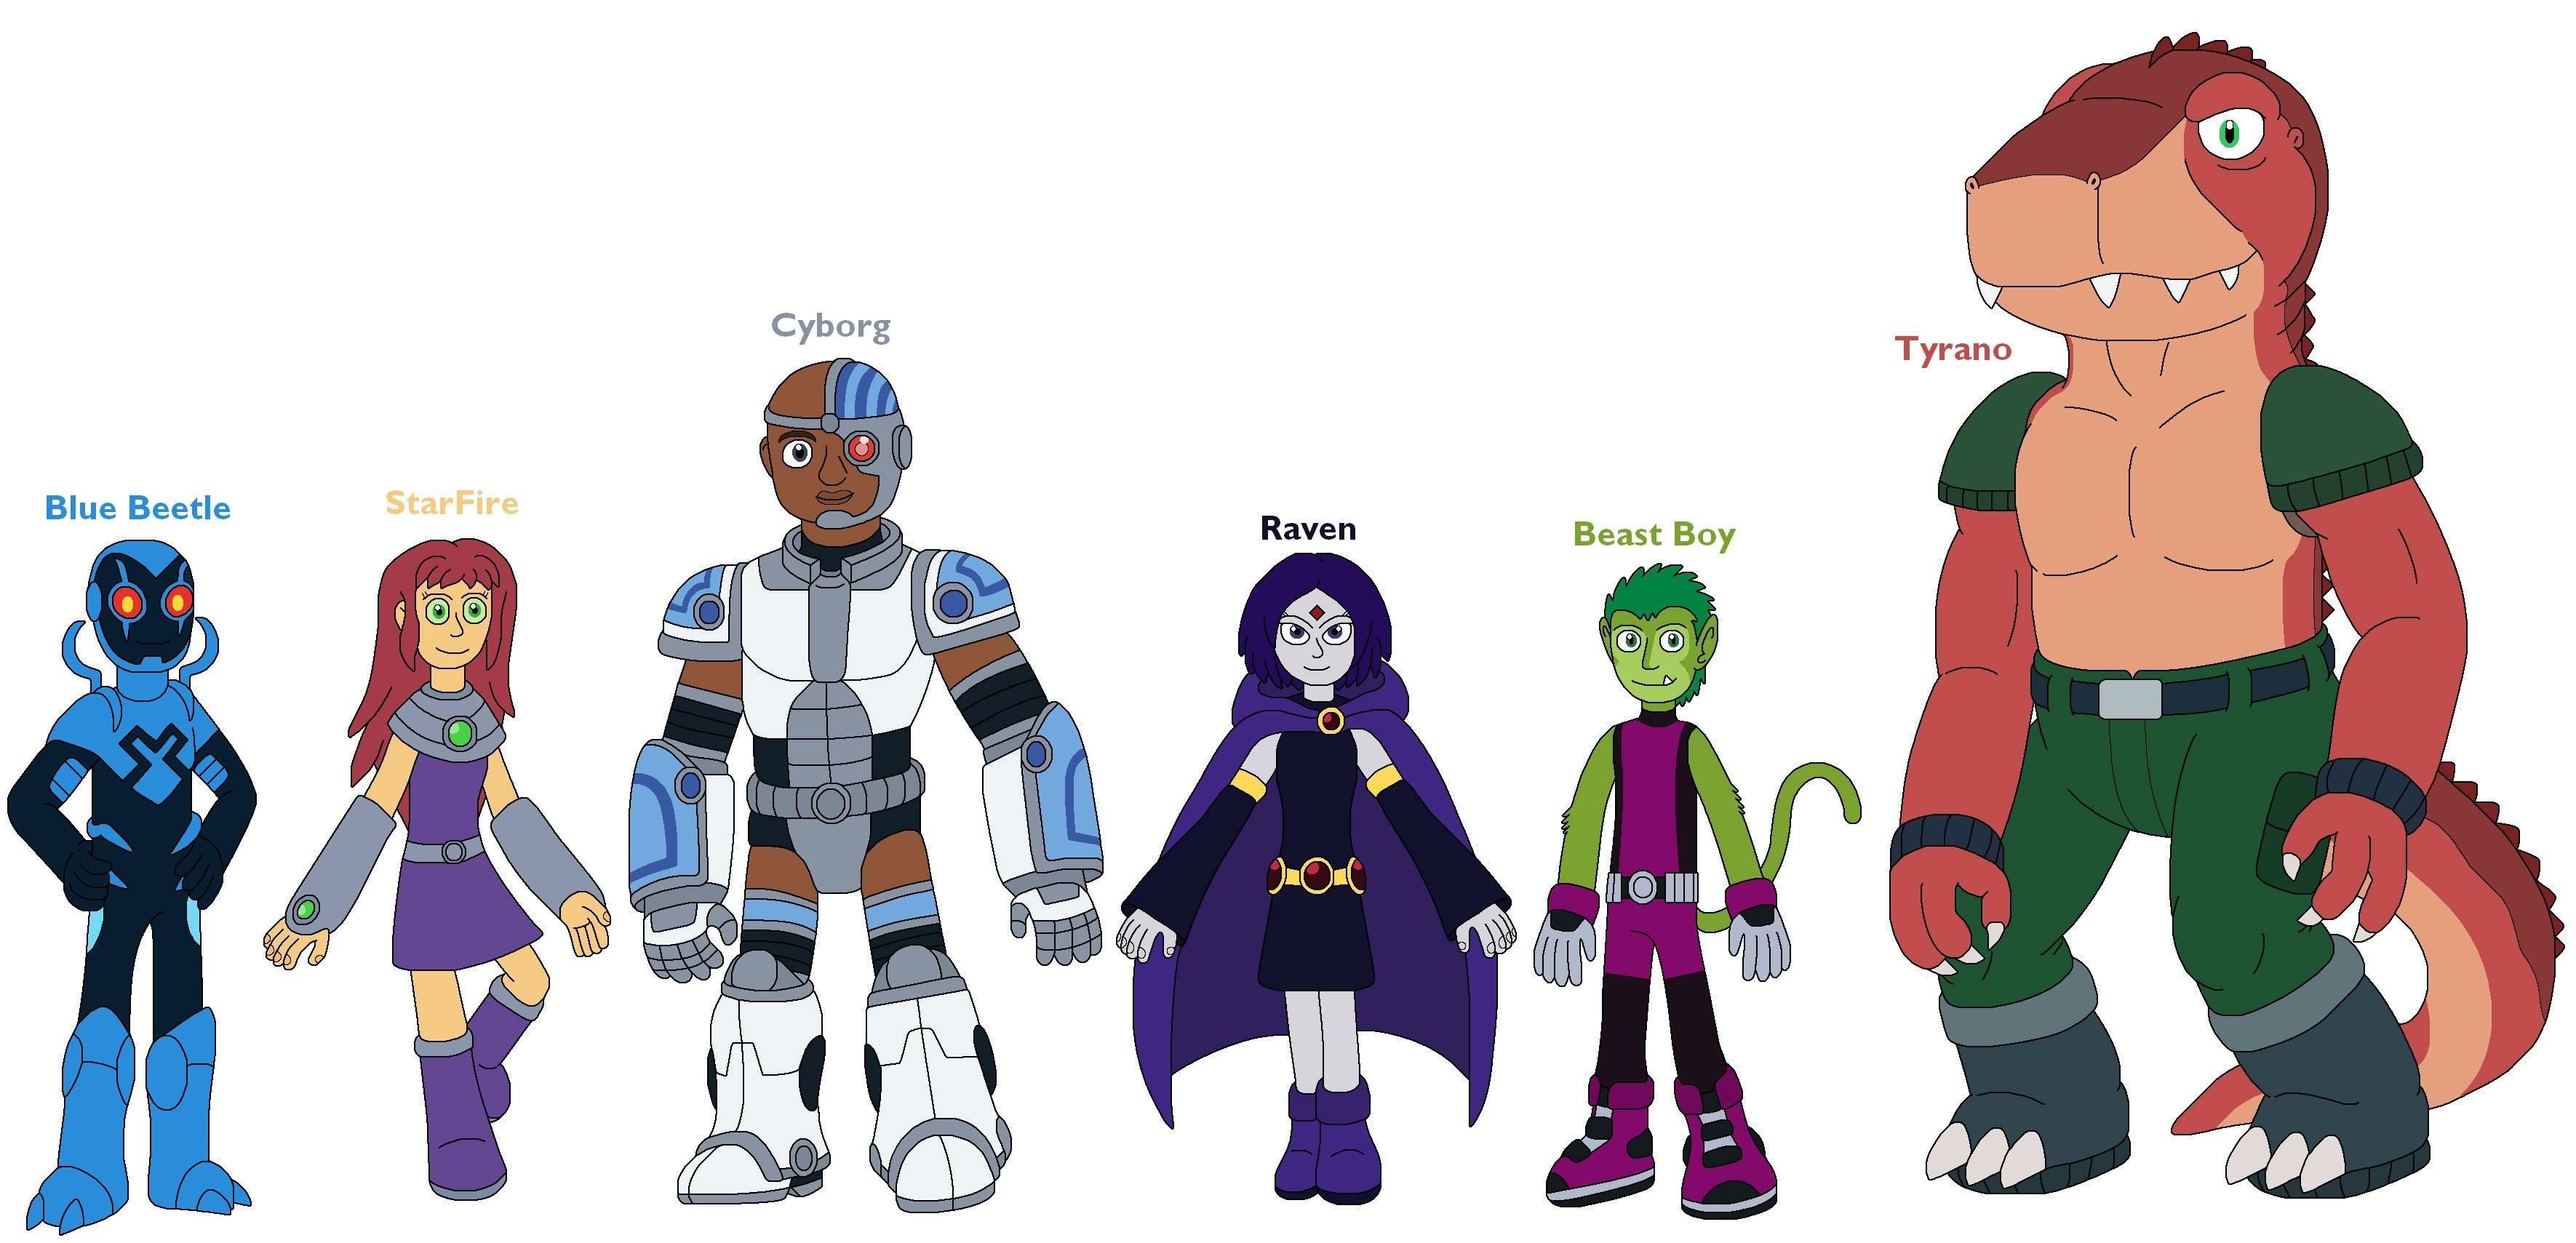 TEEN TITANS animation action adventure superhero dc-comics comic (25)  wallpaper     353481   WallpaperUP